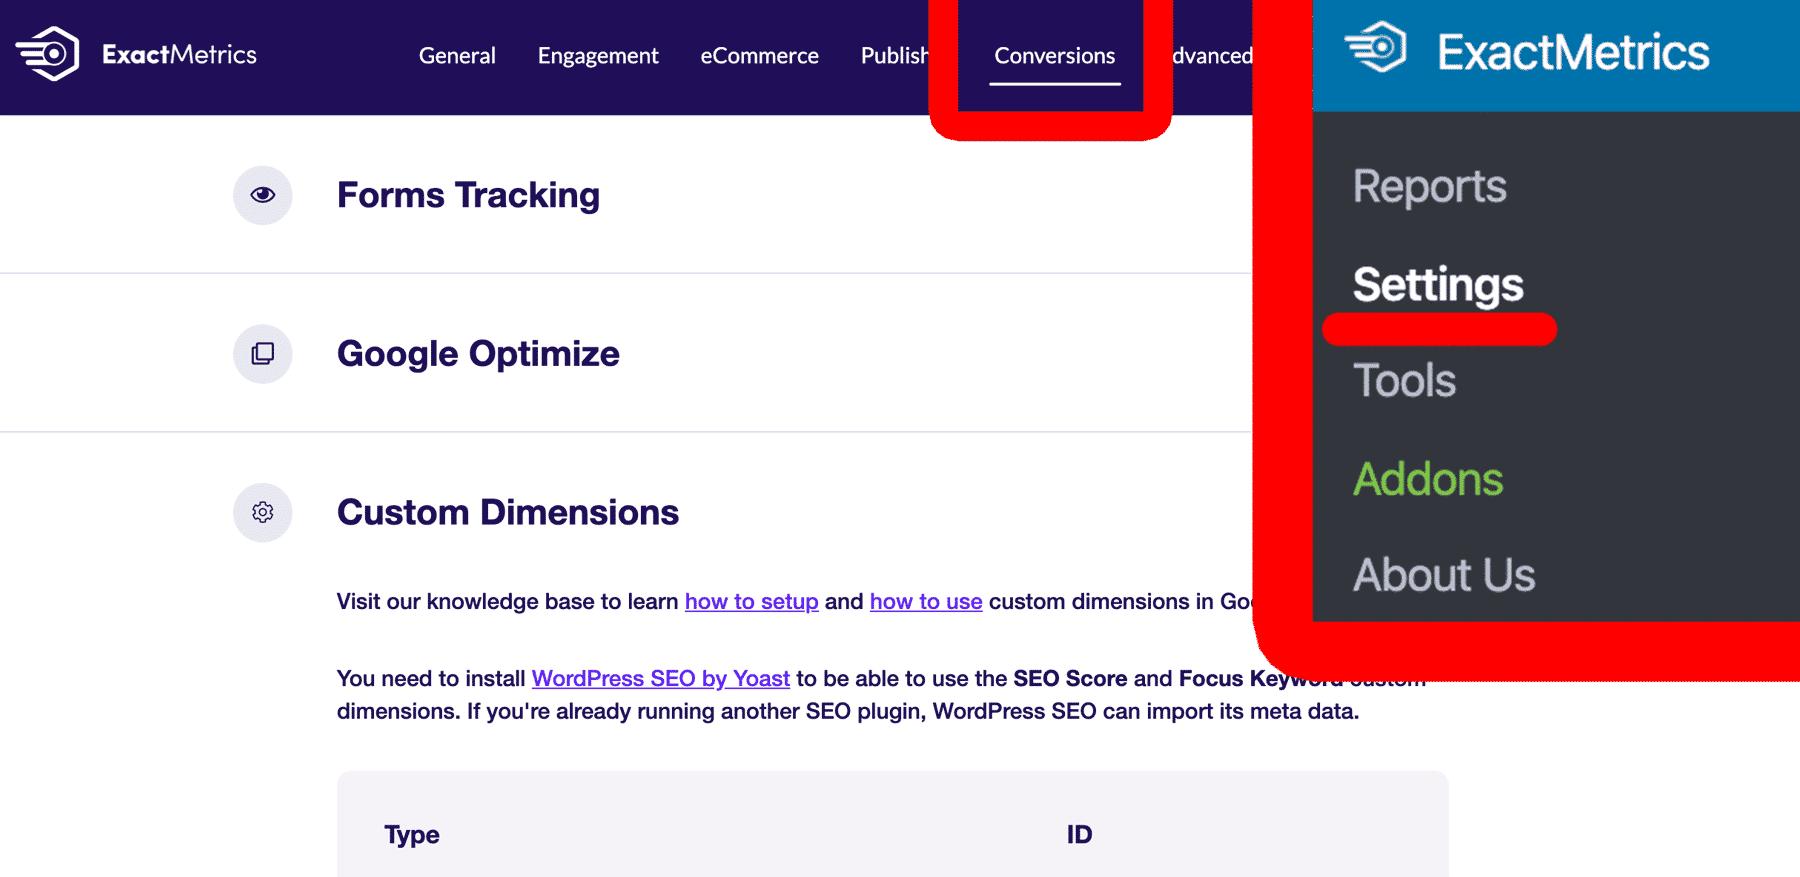 conversions-settings-exactmetrics